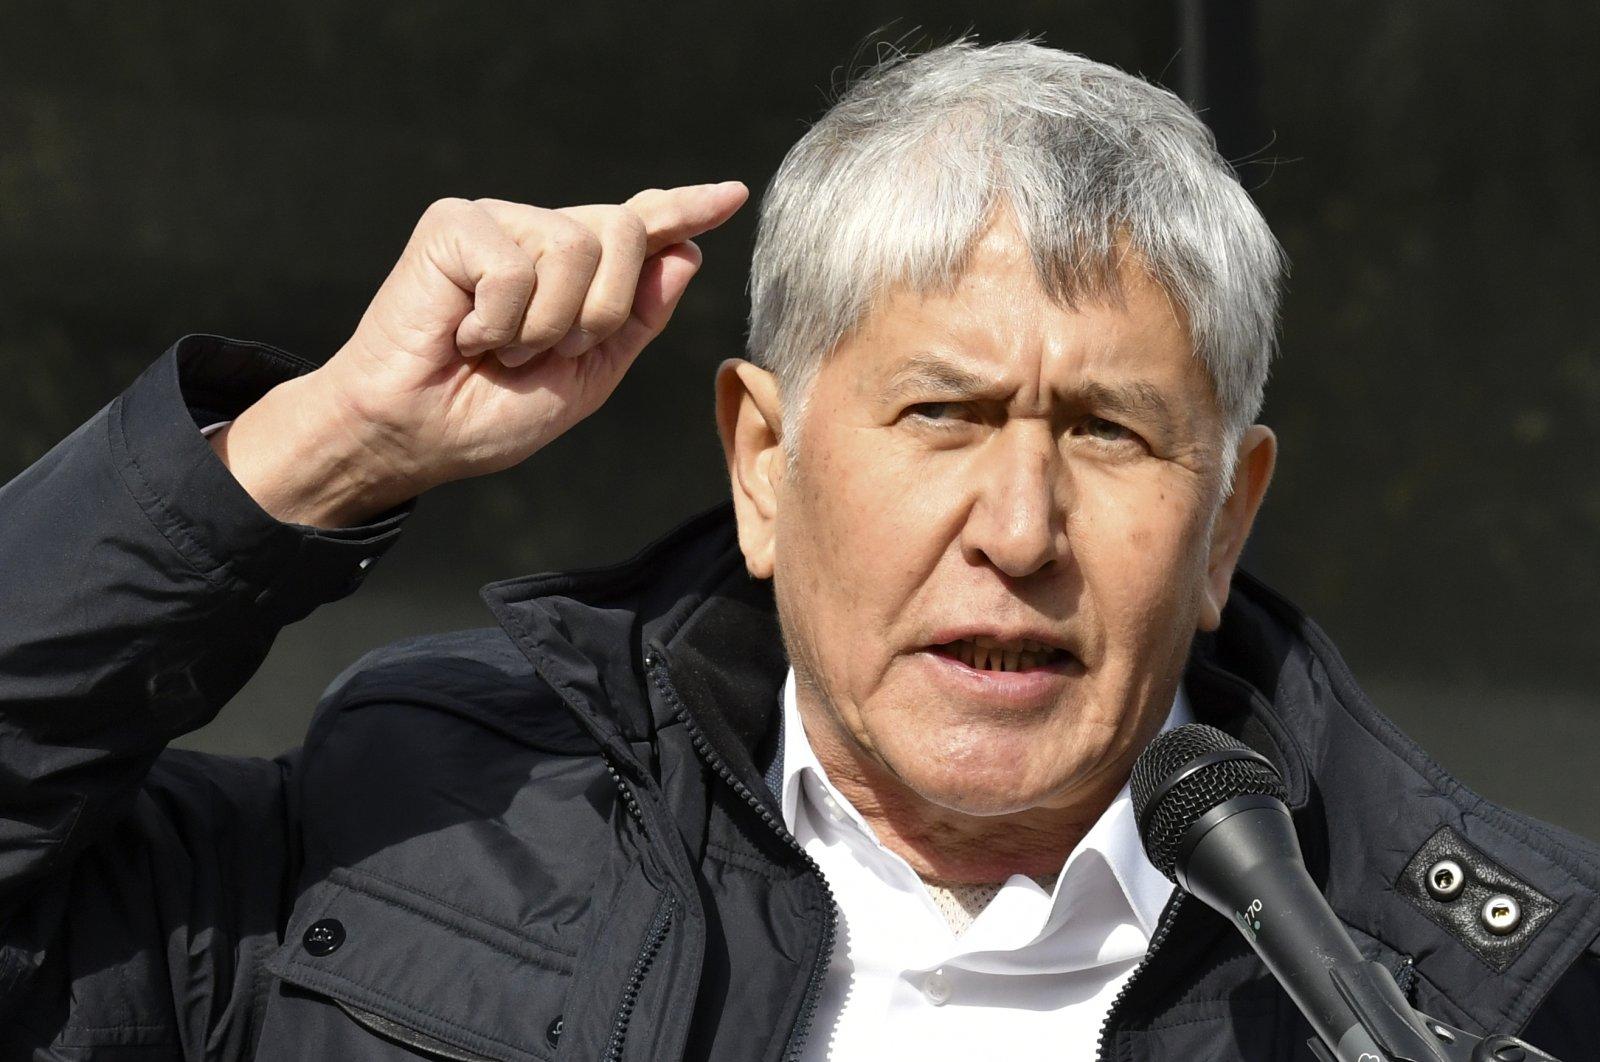 Former President Almazbek Atambayev speaks to his supporters during a rally in Bishkek, Kyrgyzstan, Friday, Oct. 9, 2020. (AP Photo)